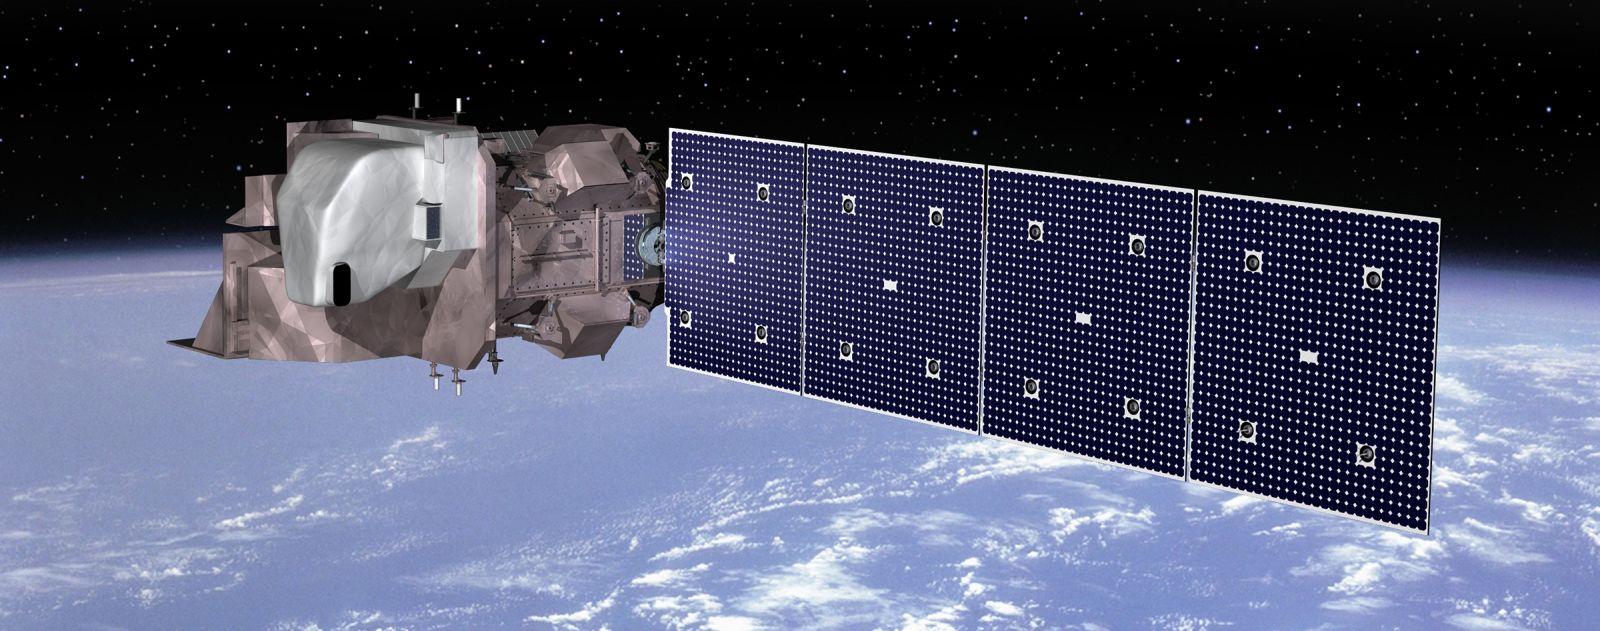 Orbital ATK Landsat 9 Artist Render Image Credit Orbital ATK